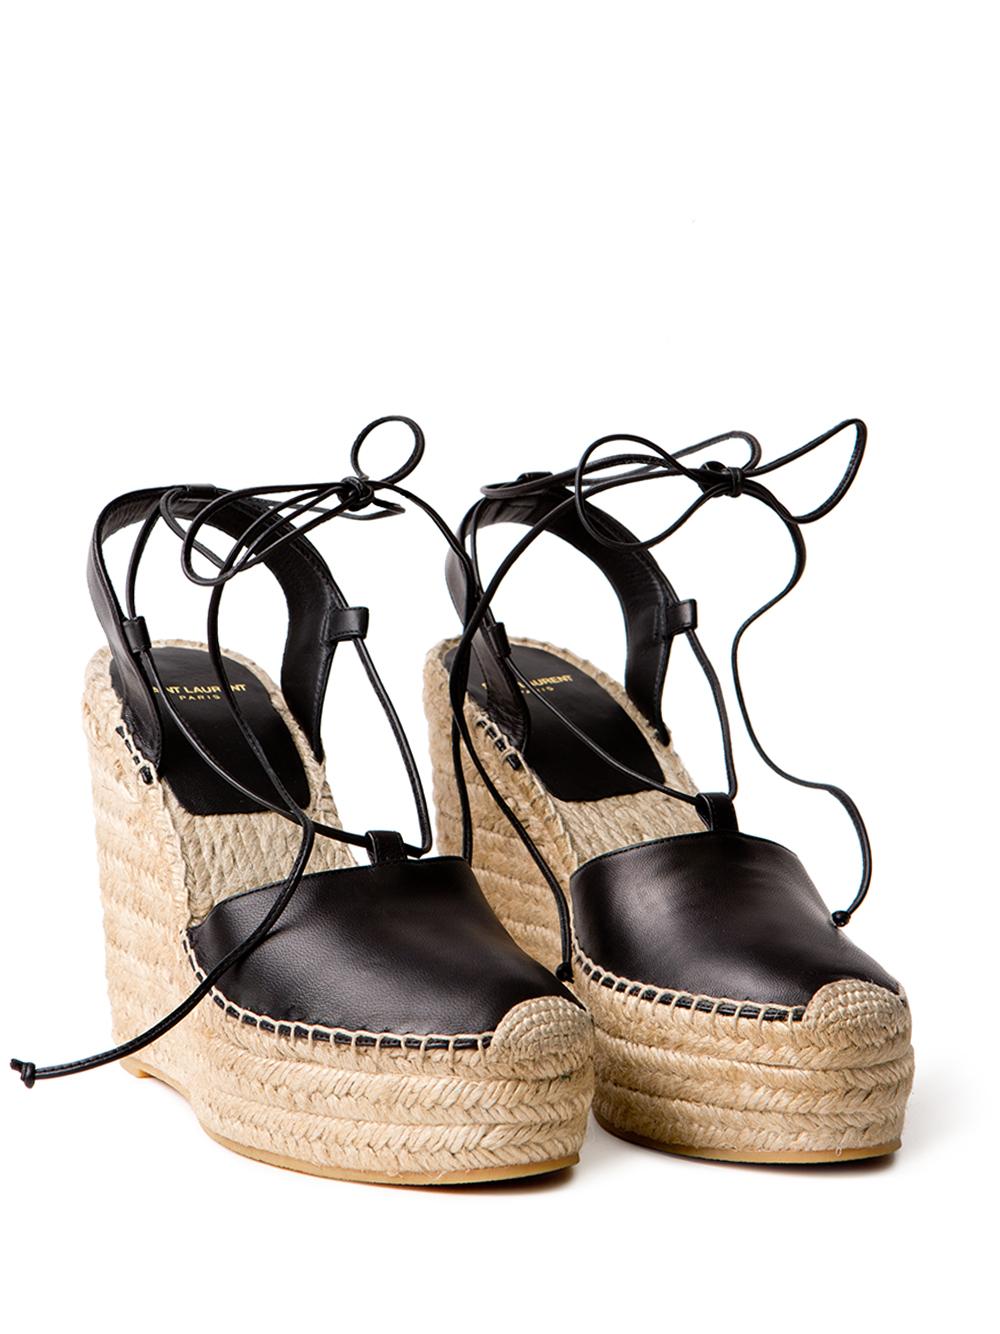 2fdb70a1409 Saint Laurent Leather Wedge Espadrilles in Black - Lyst